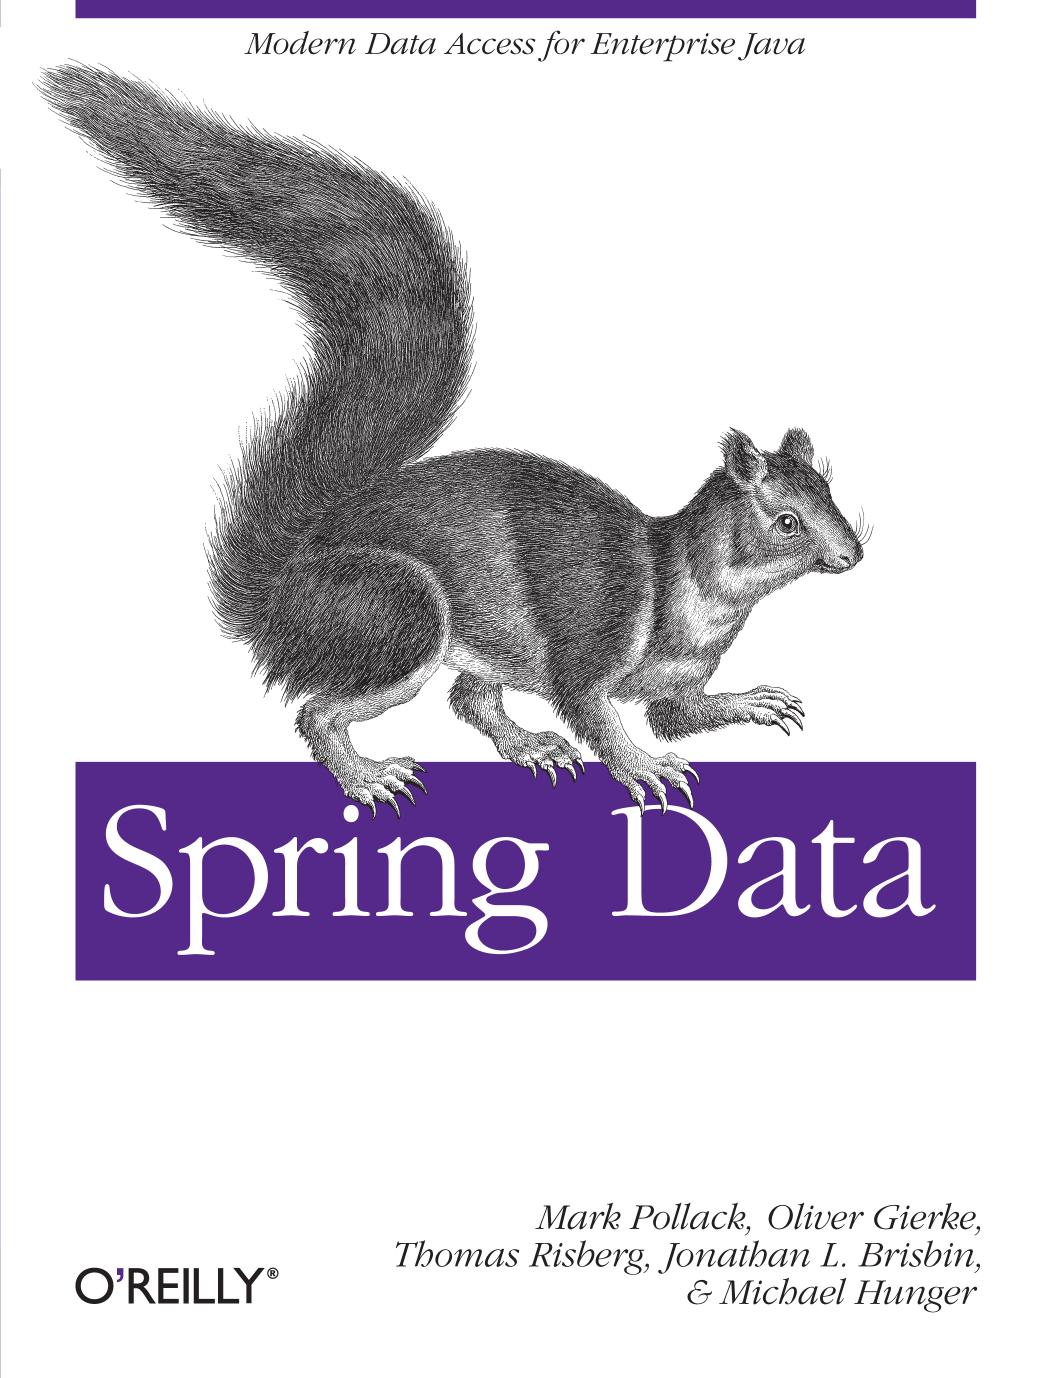 Spring Data - Risk Commerce   manualzz com